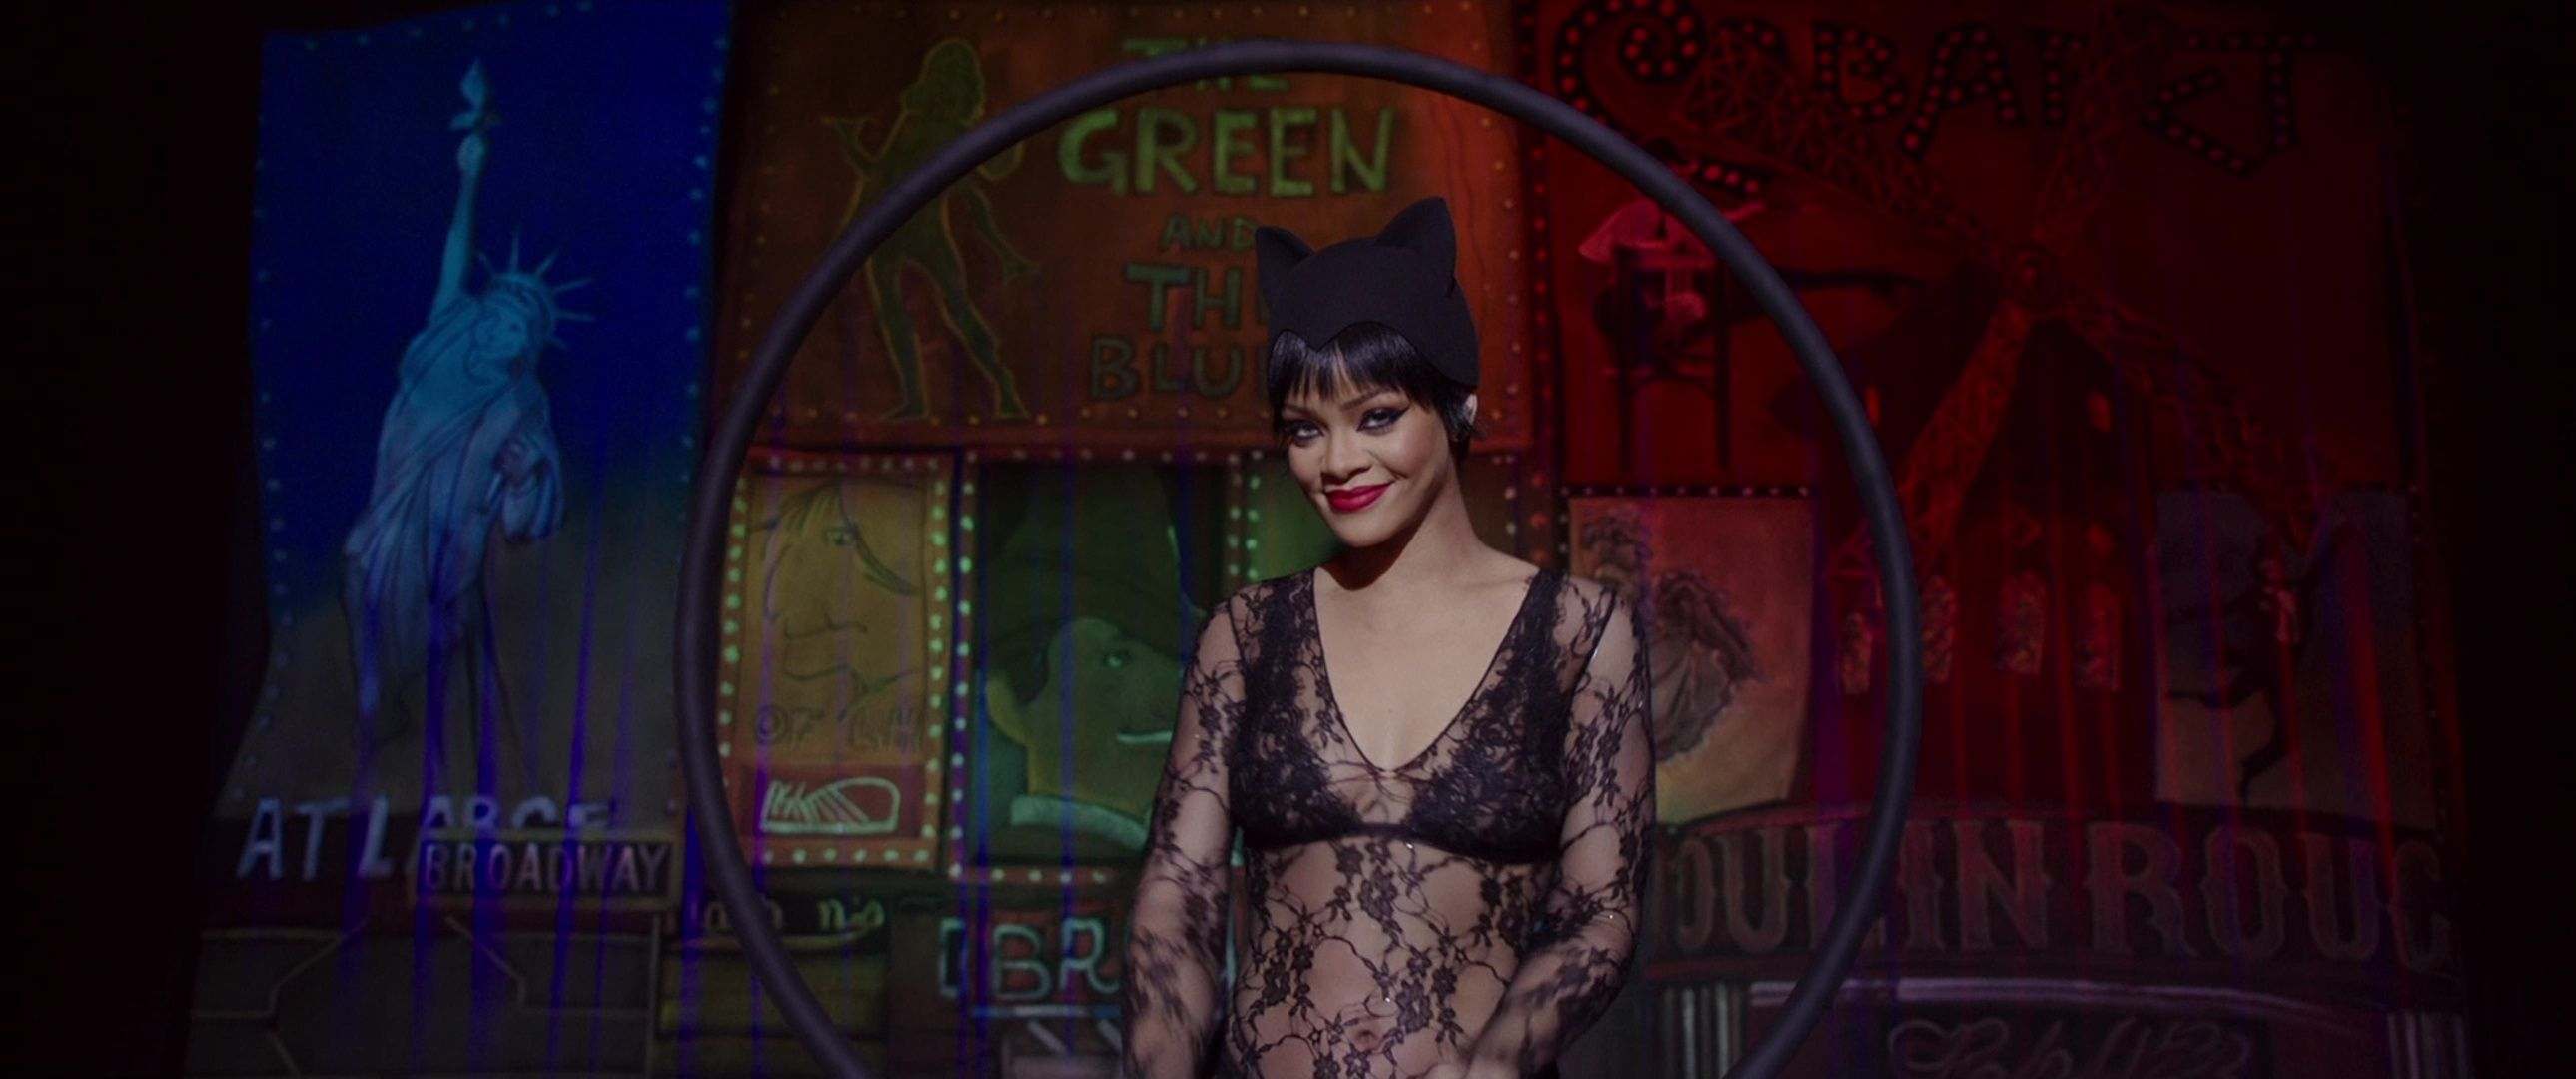 Rihanna-Sexy-42-thefappeningblog.com_.jpg